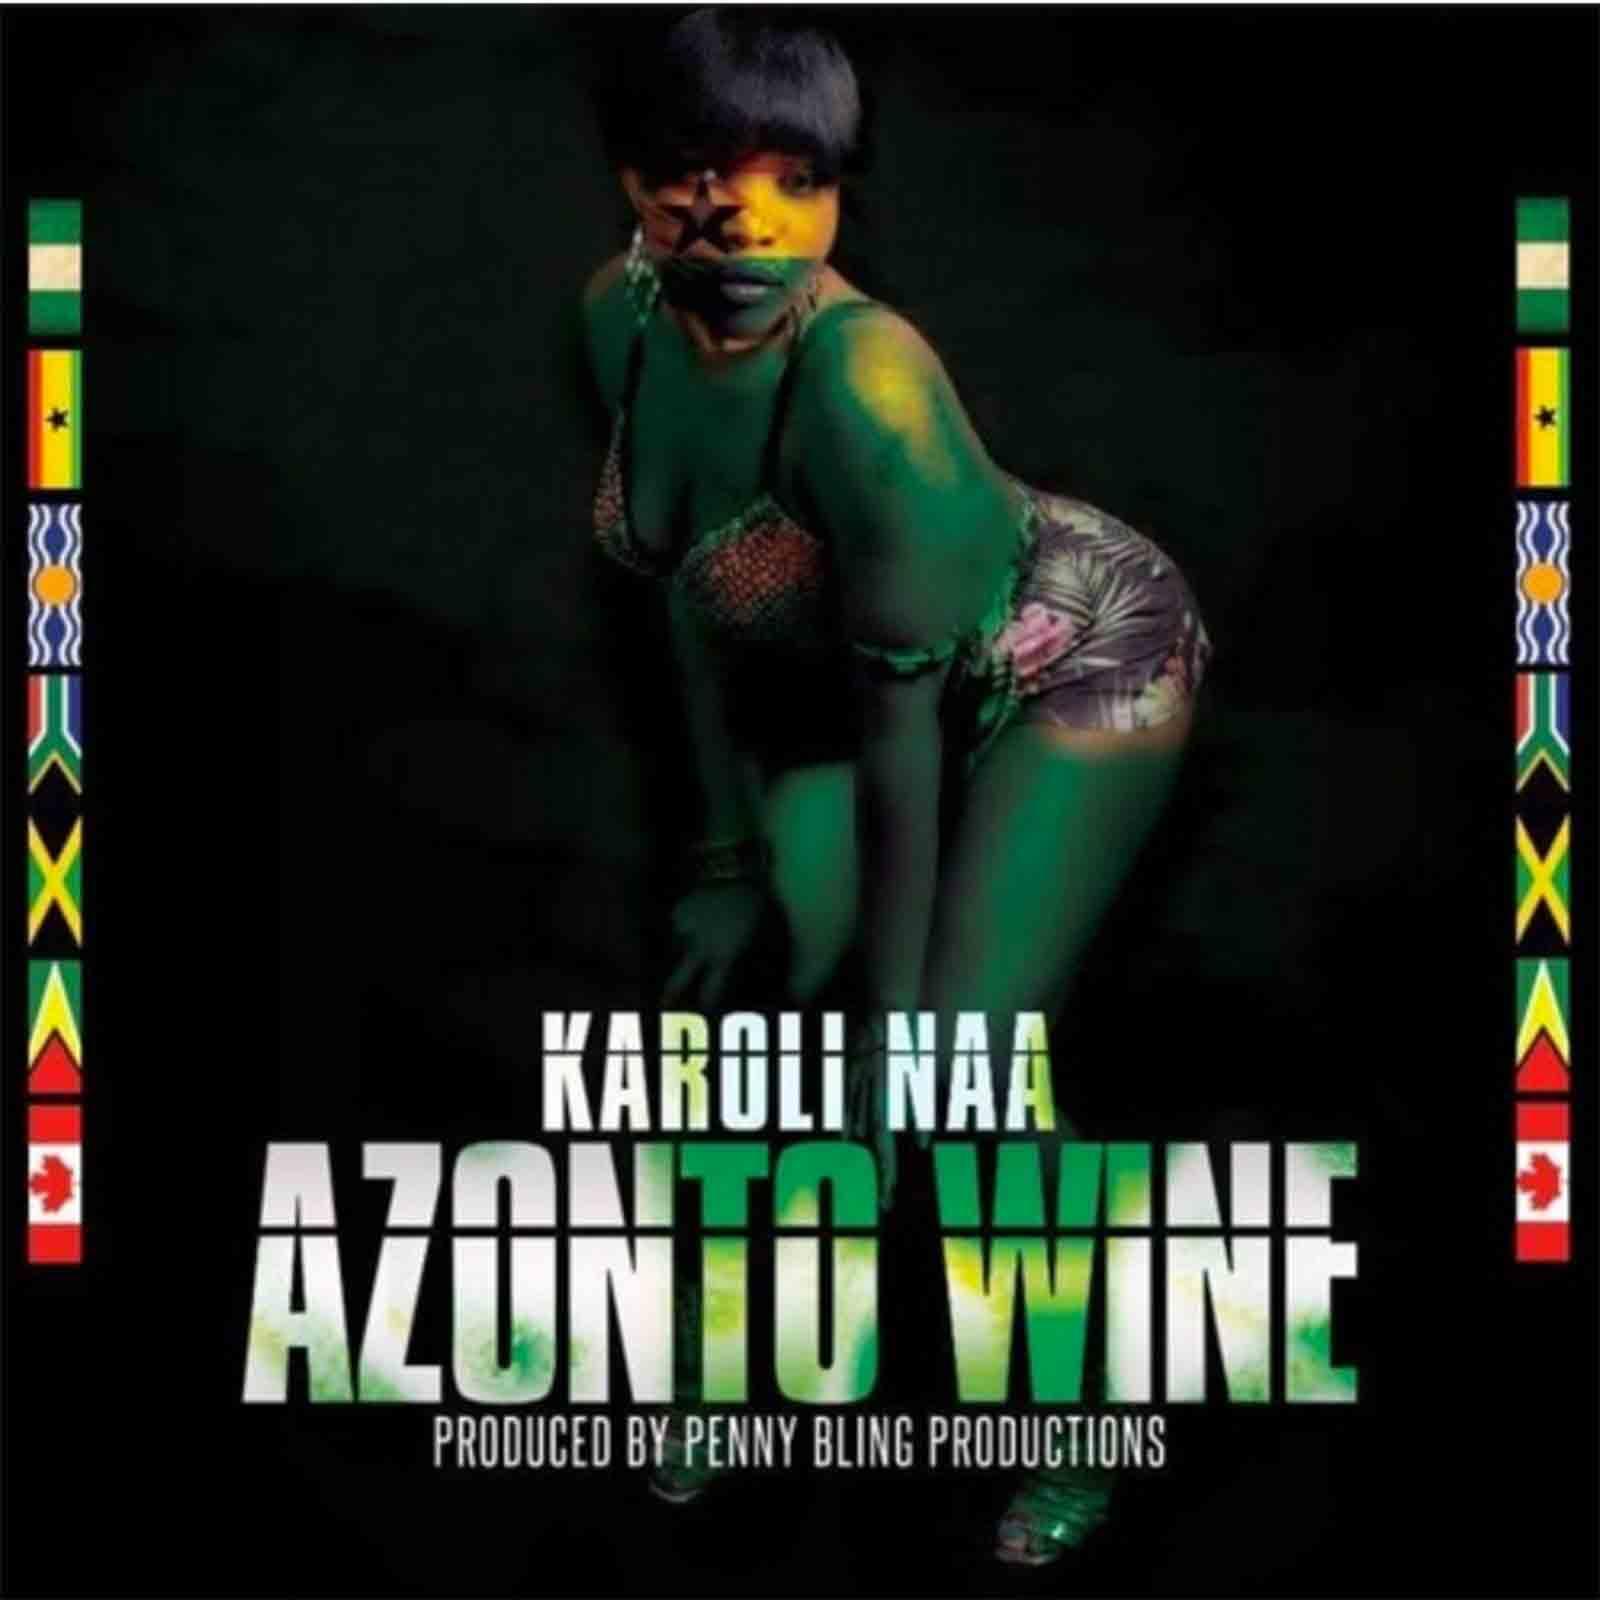 Azonto Wine by Karoli Naa